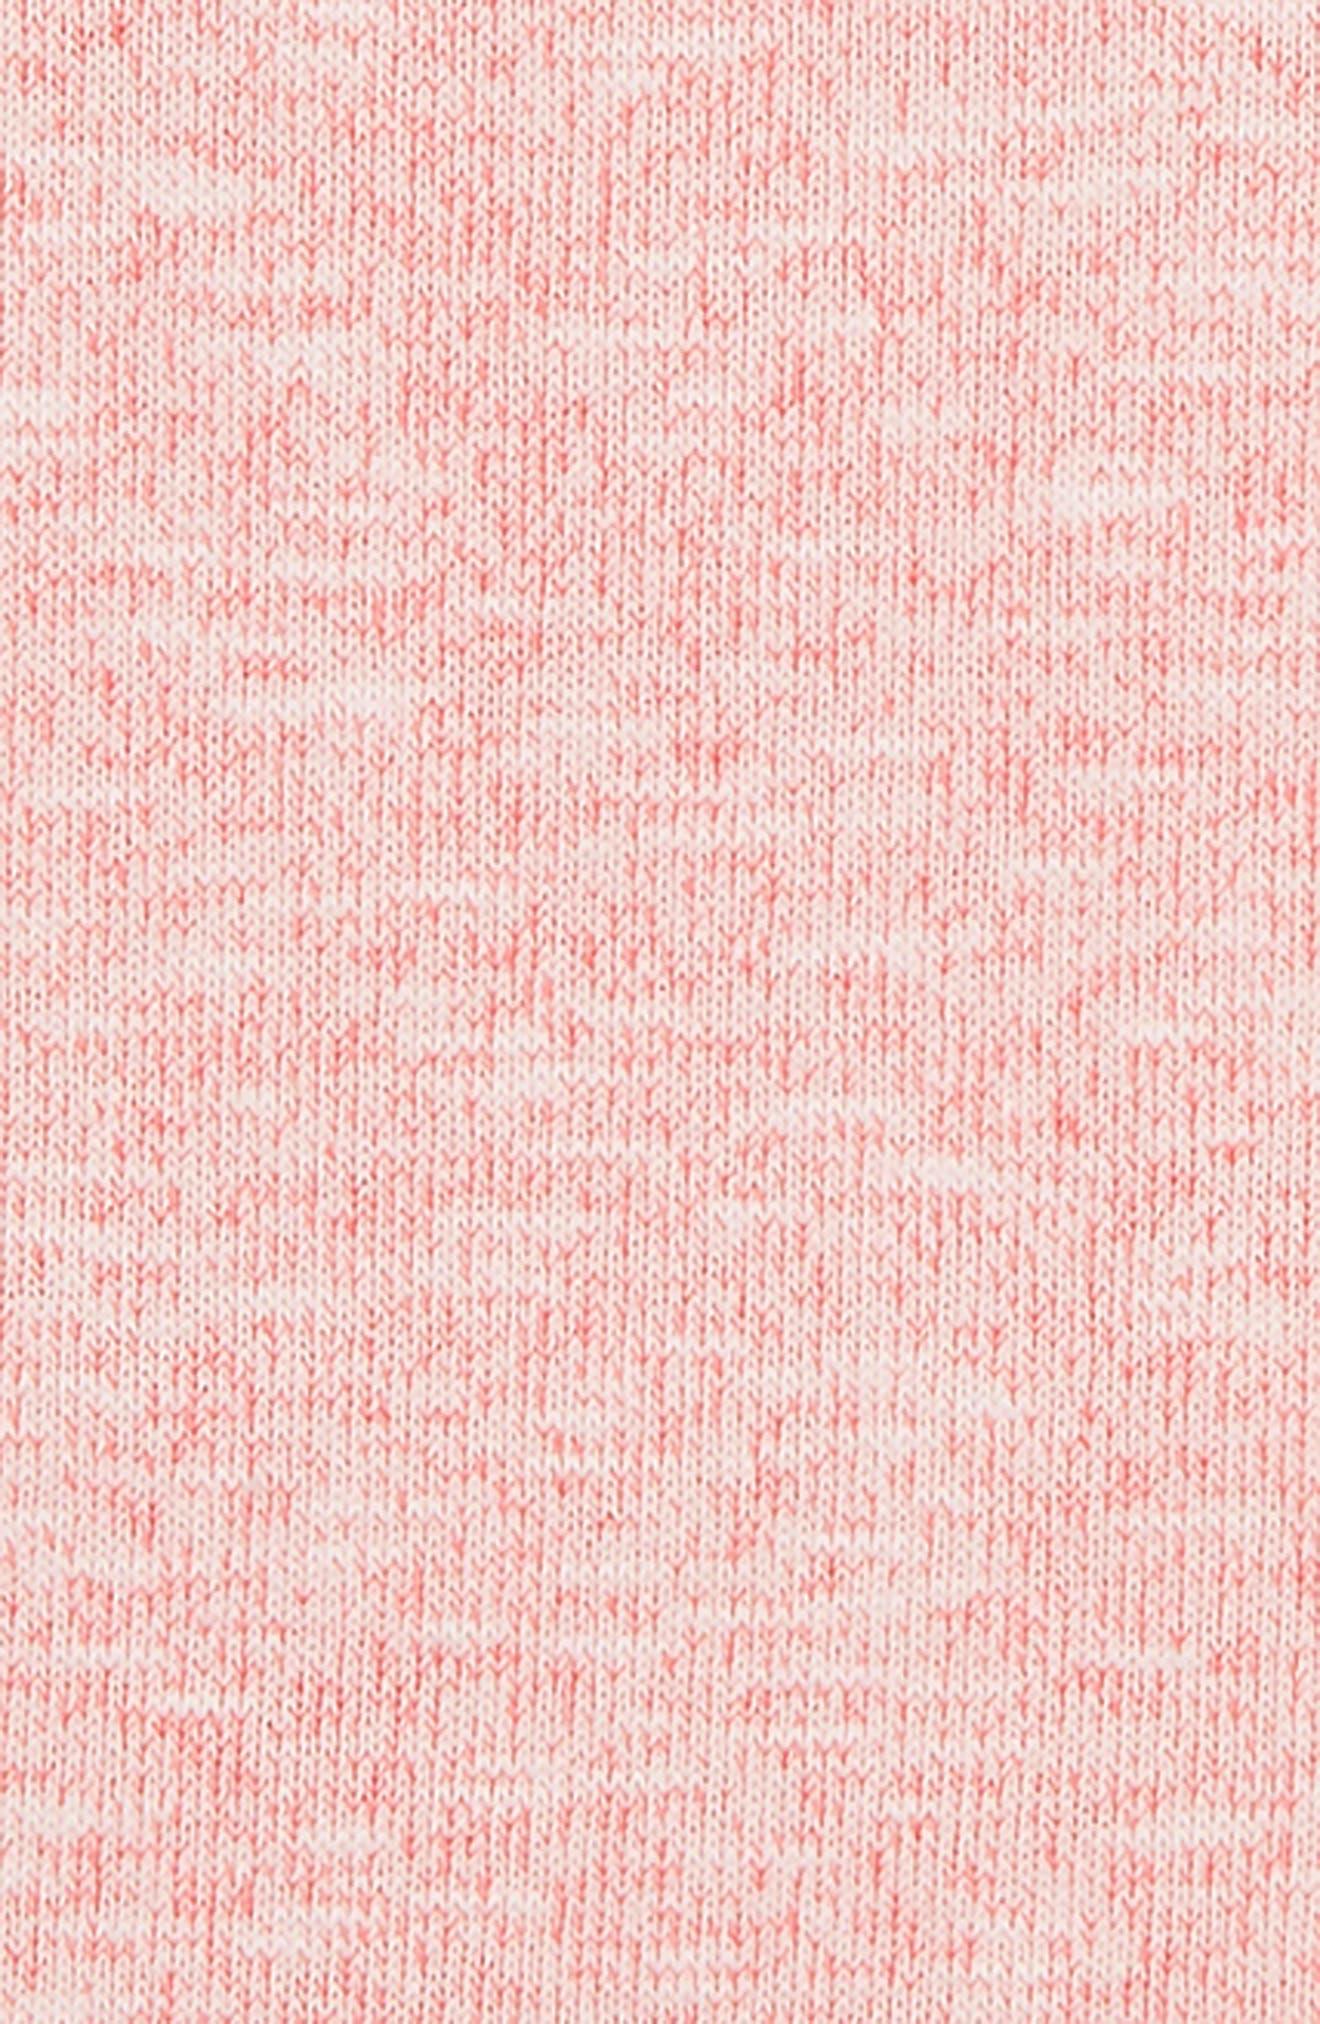 SPLENDID,                             Knit Top,                             Alternate thumbnail 2, color,                             SHANGRI LA ROSE